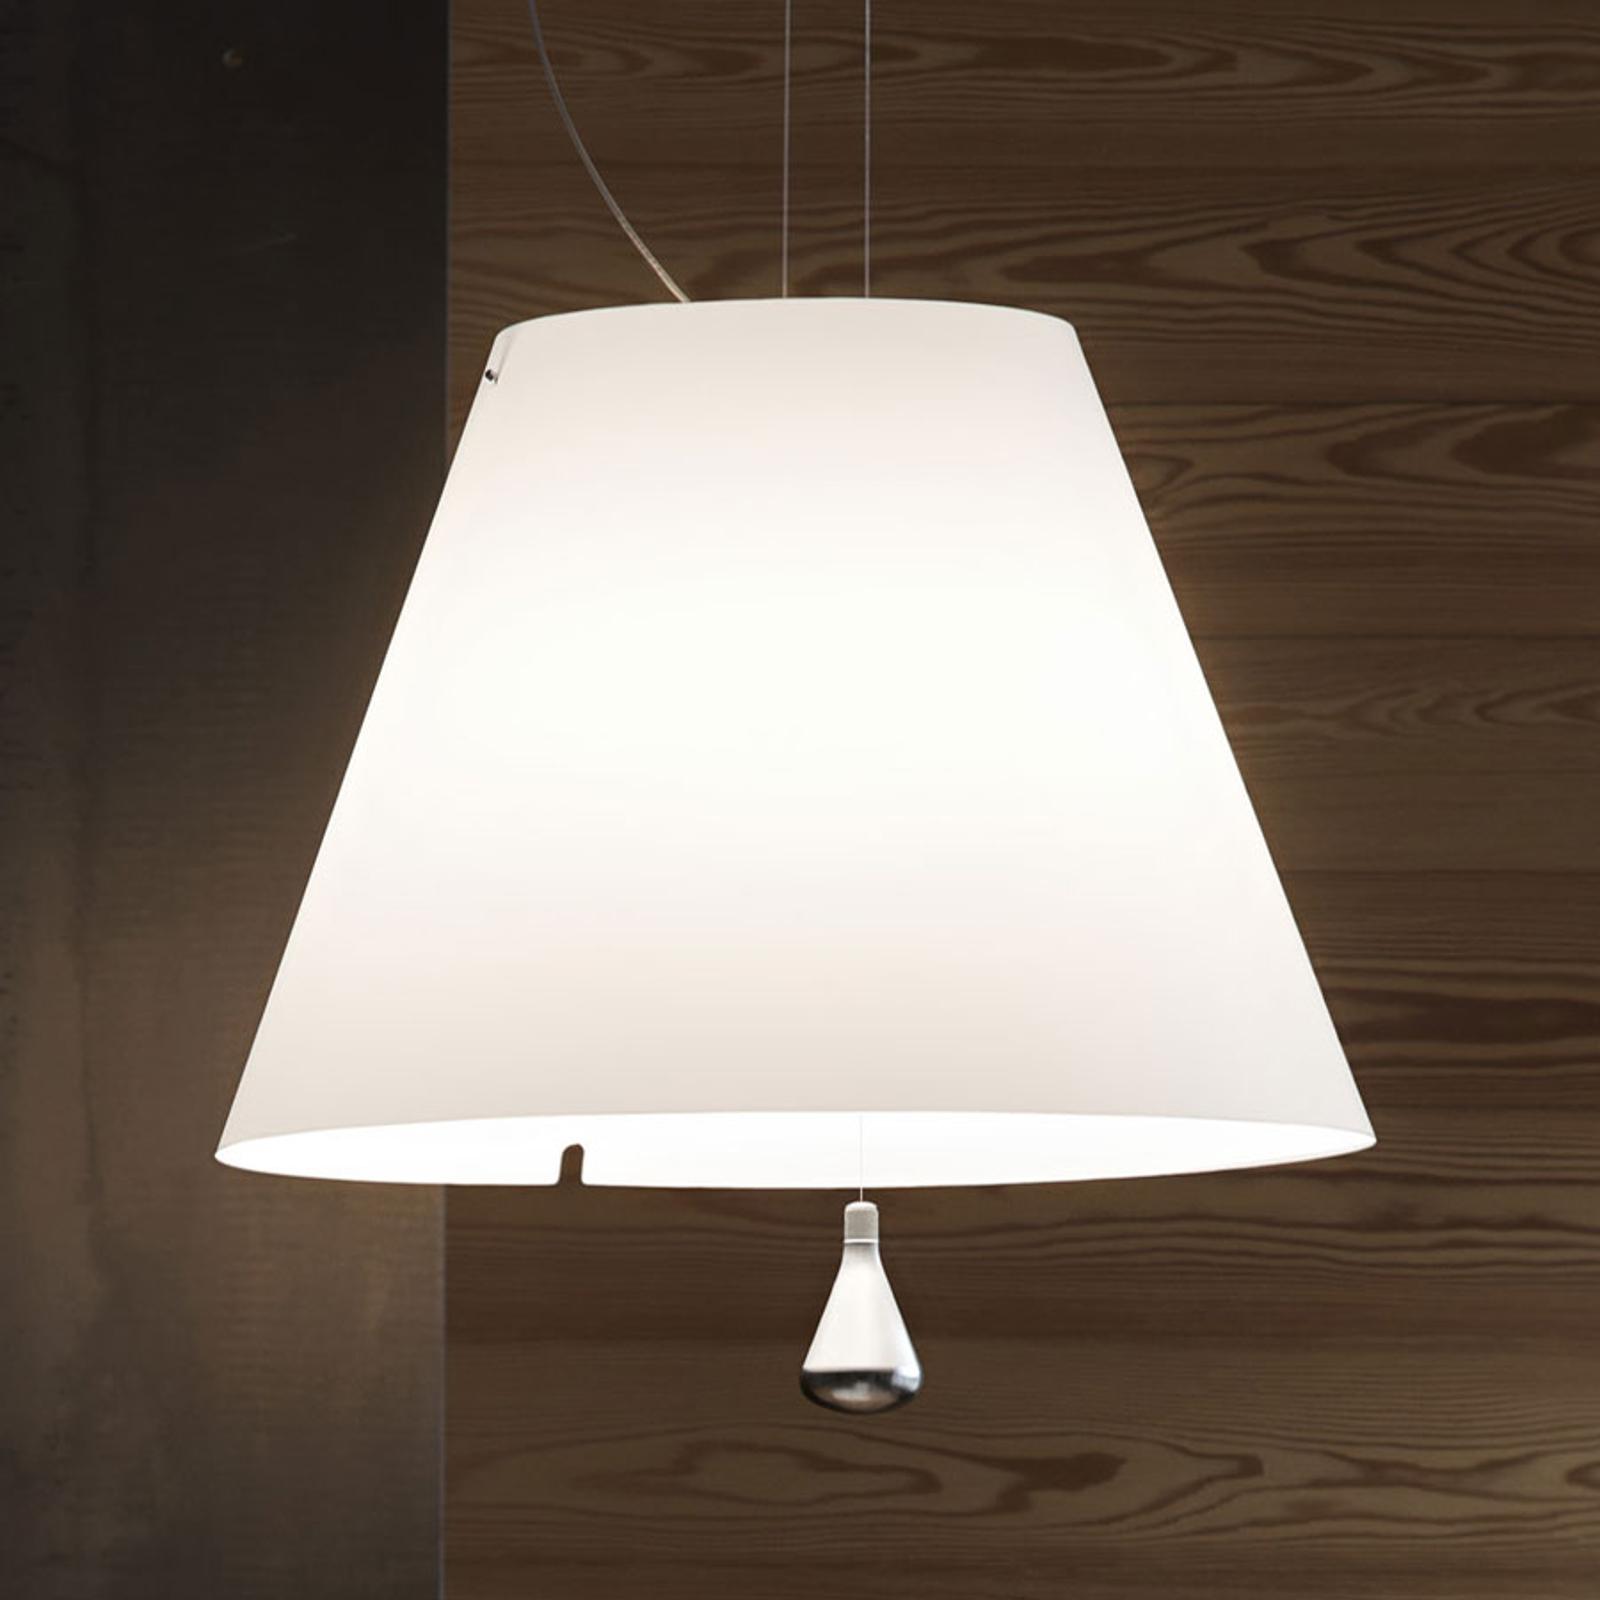 Luceplan Costanza lampa wisząca D13sas, biała